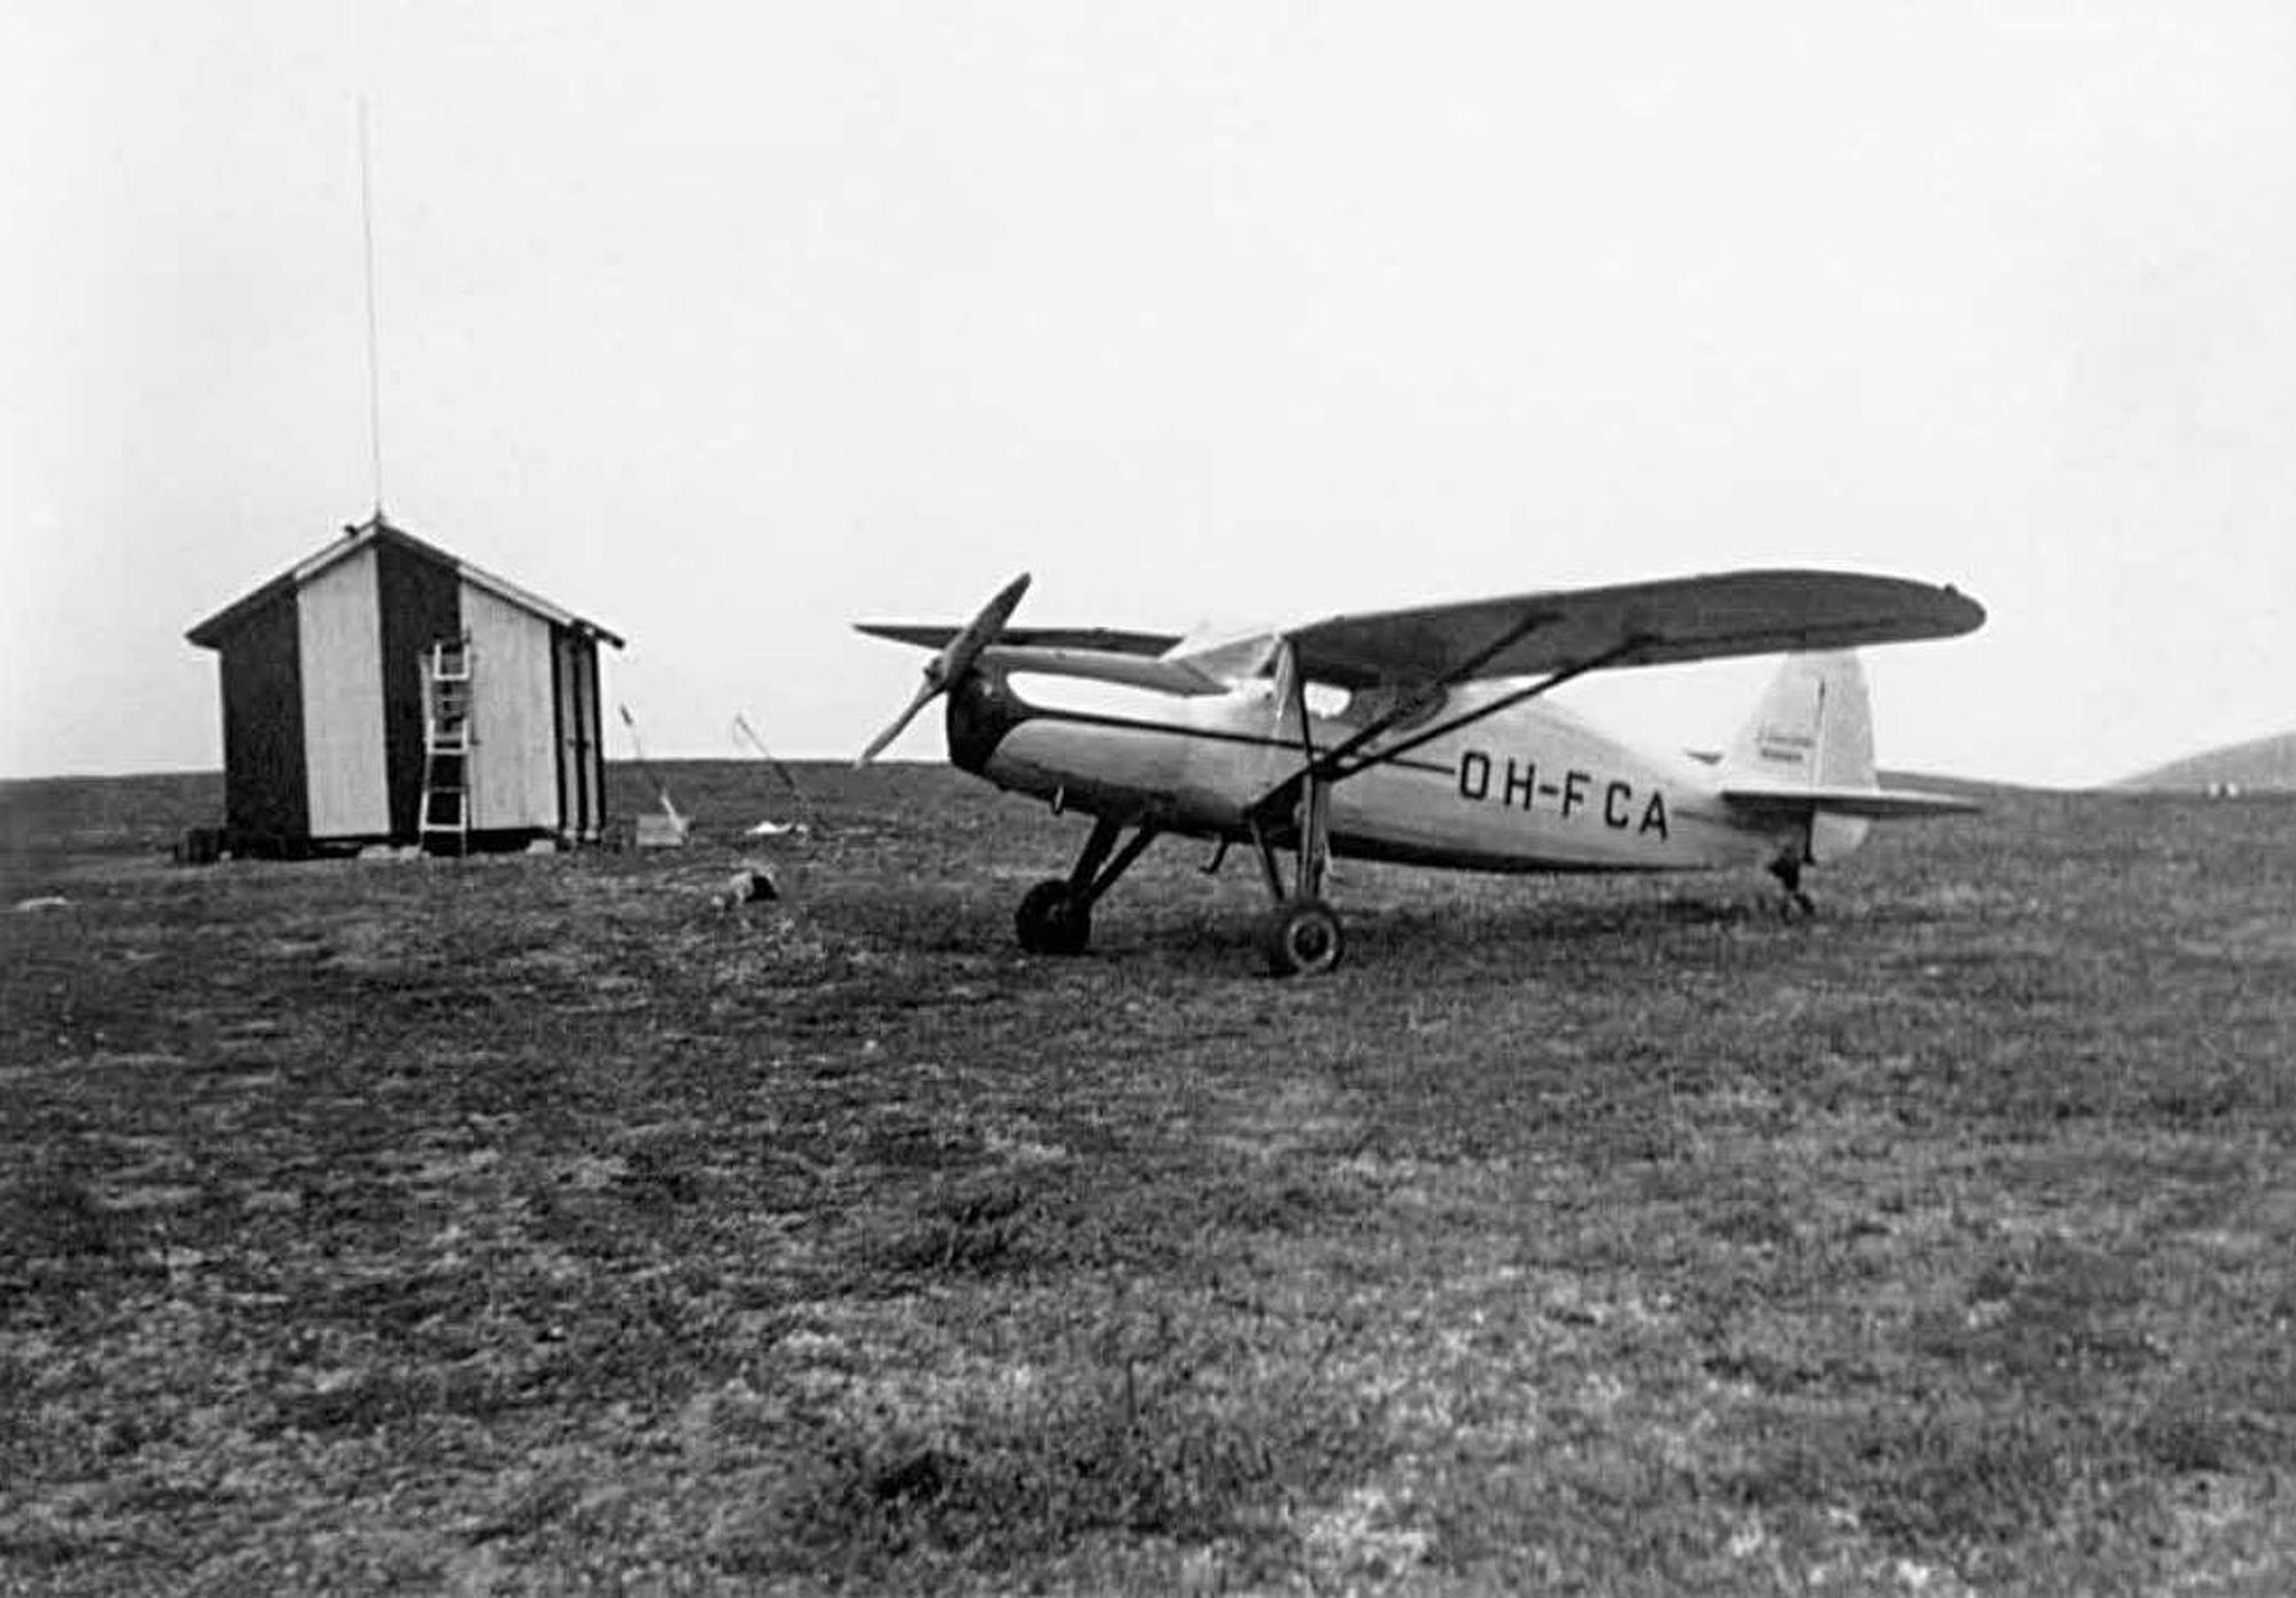 Ensimmäinen Lentokone